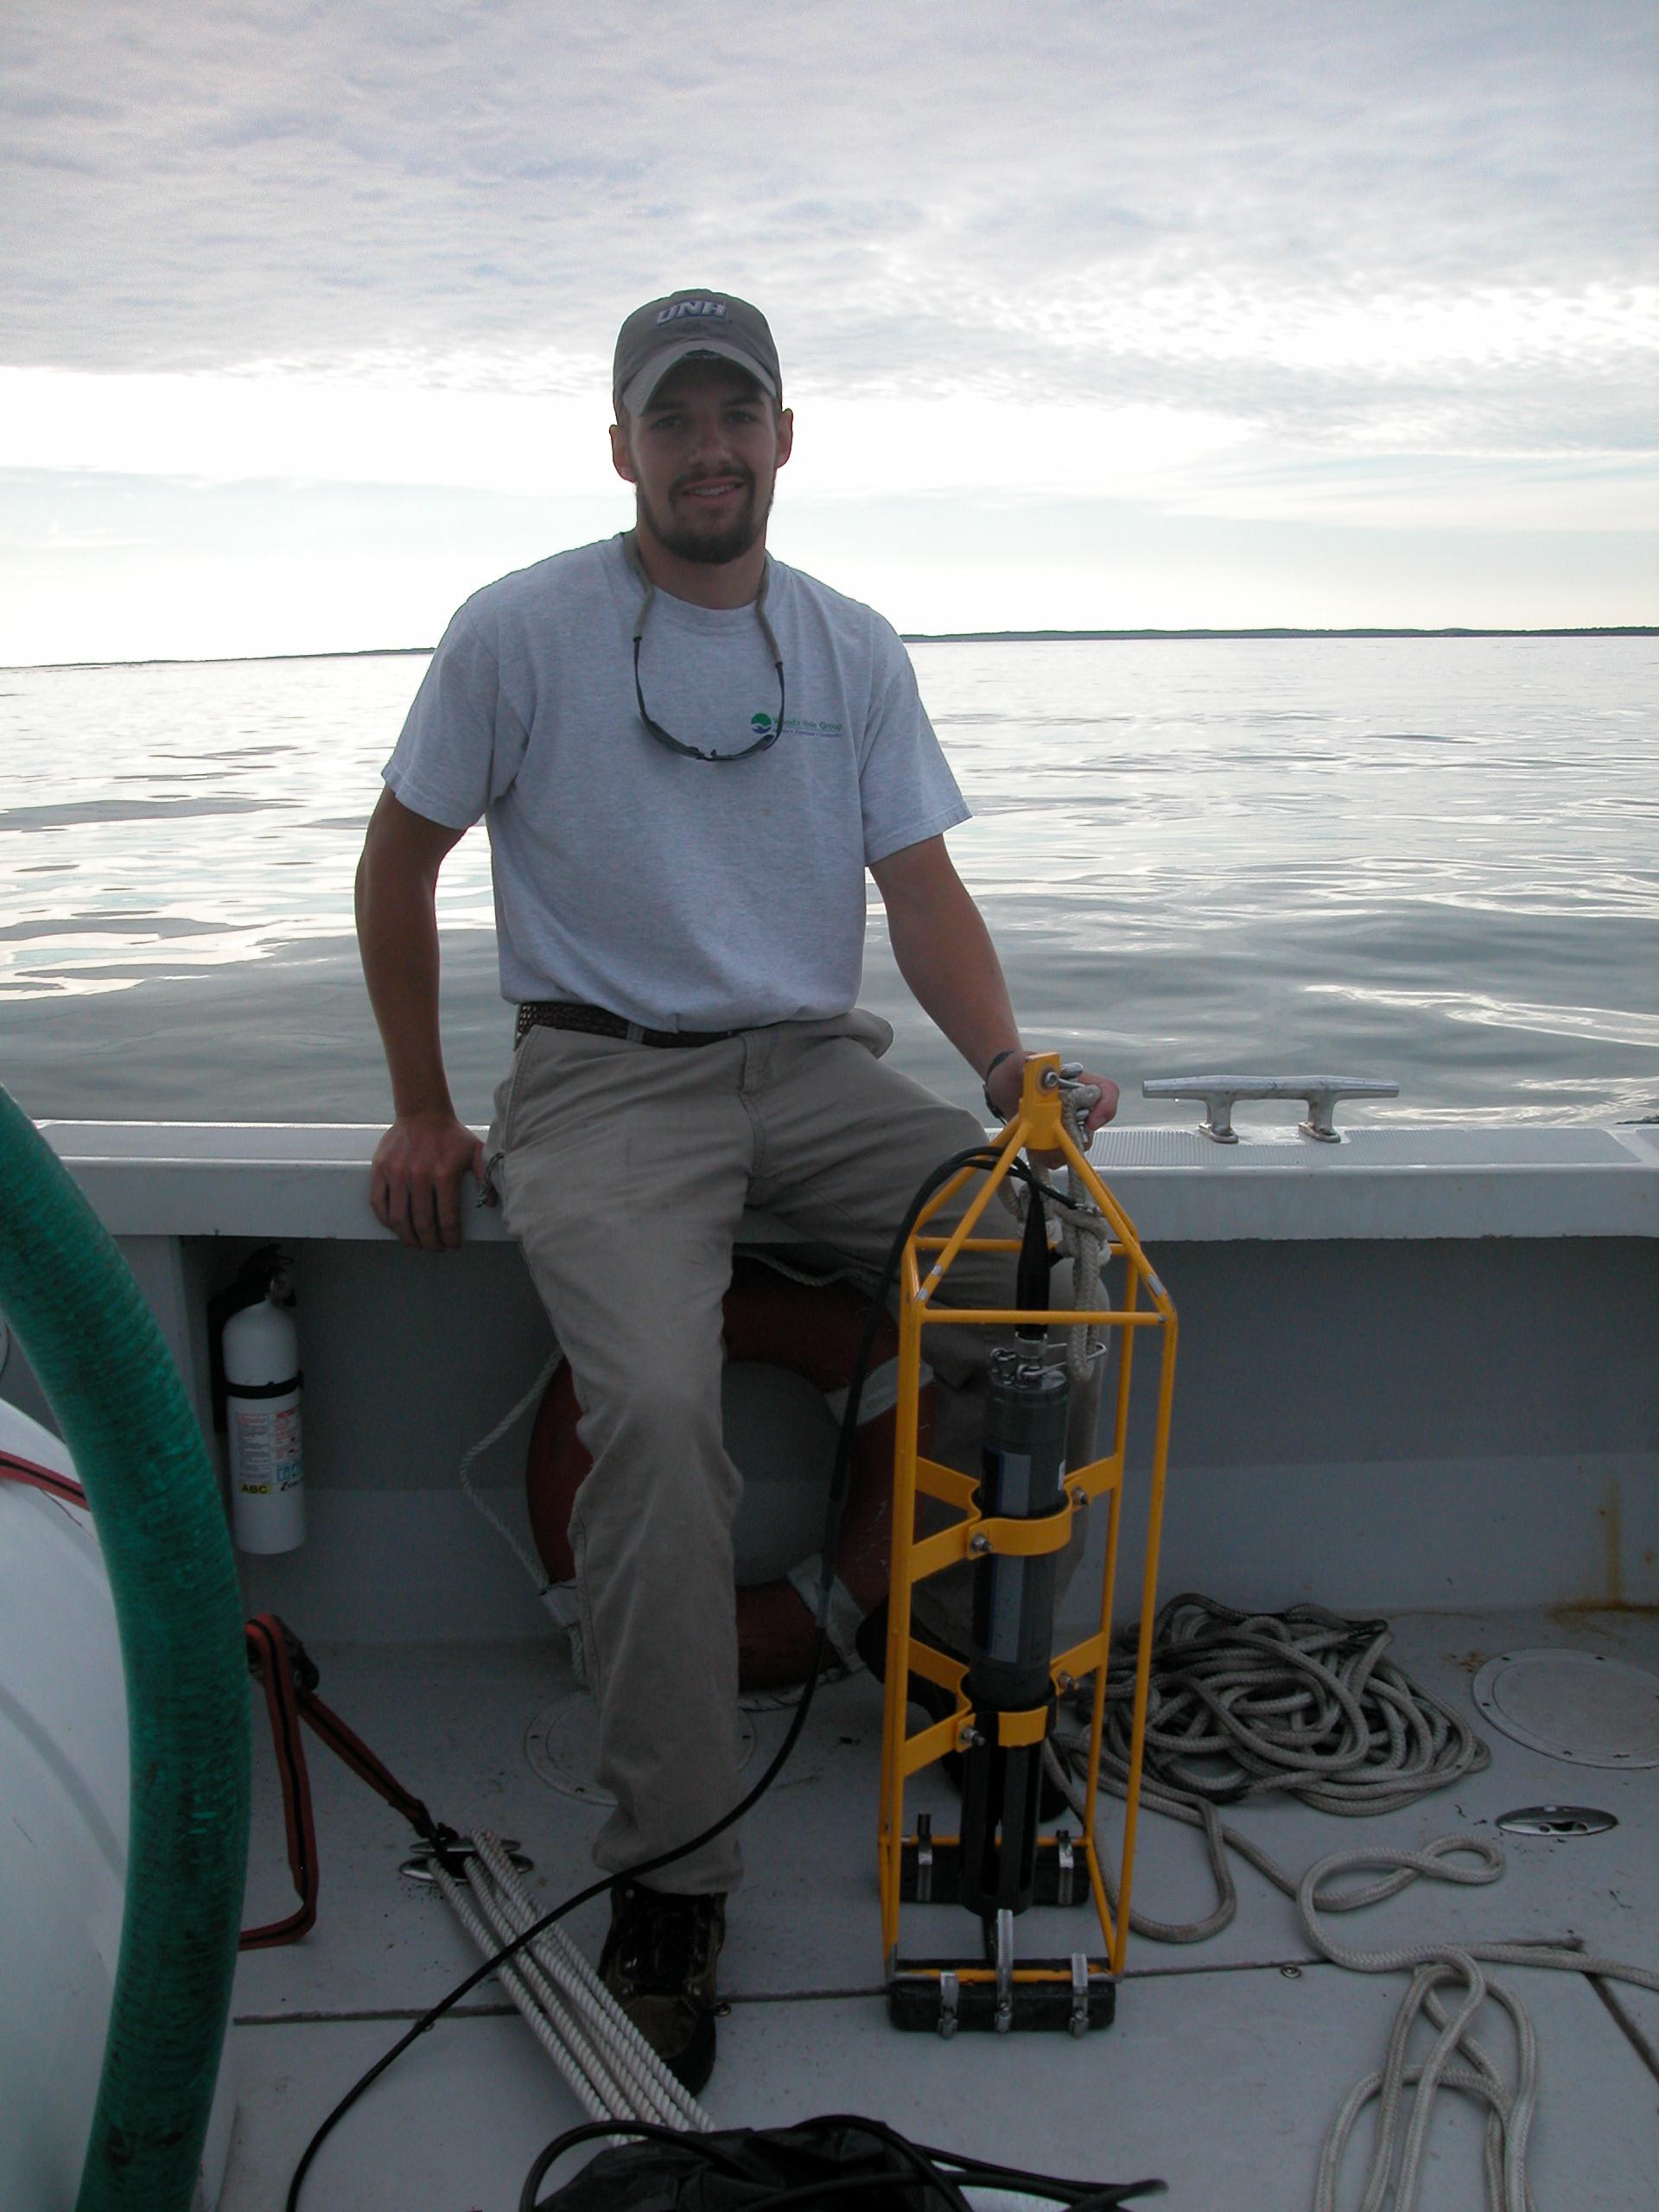 Jon Fincke aboard Baykeeper